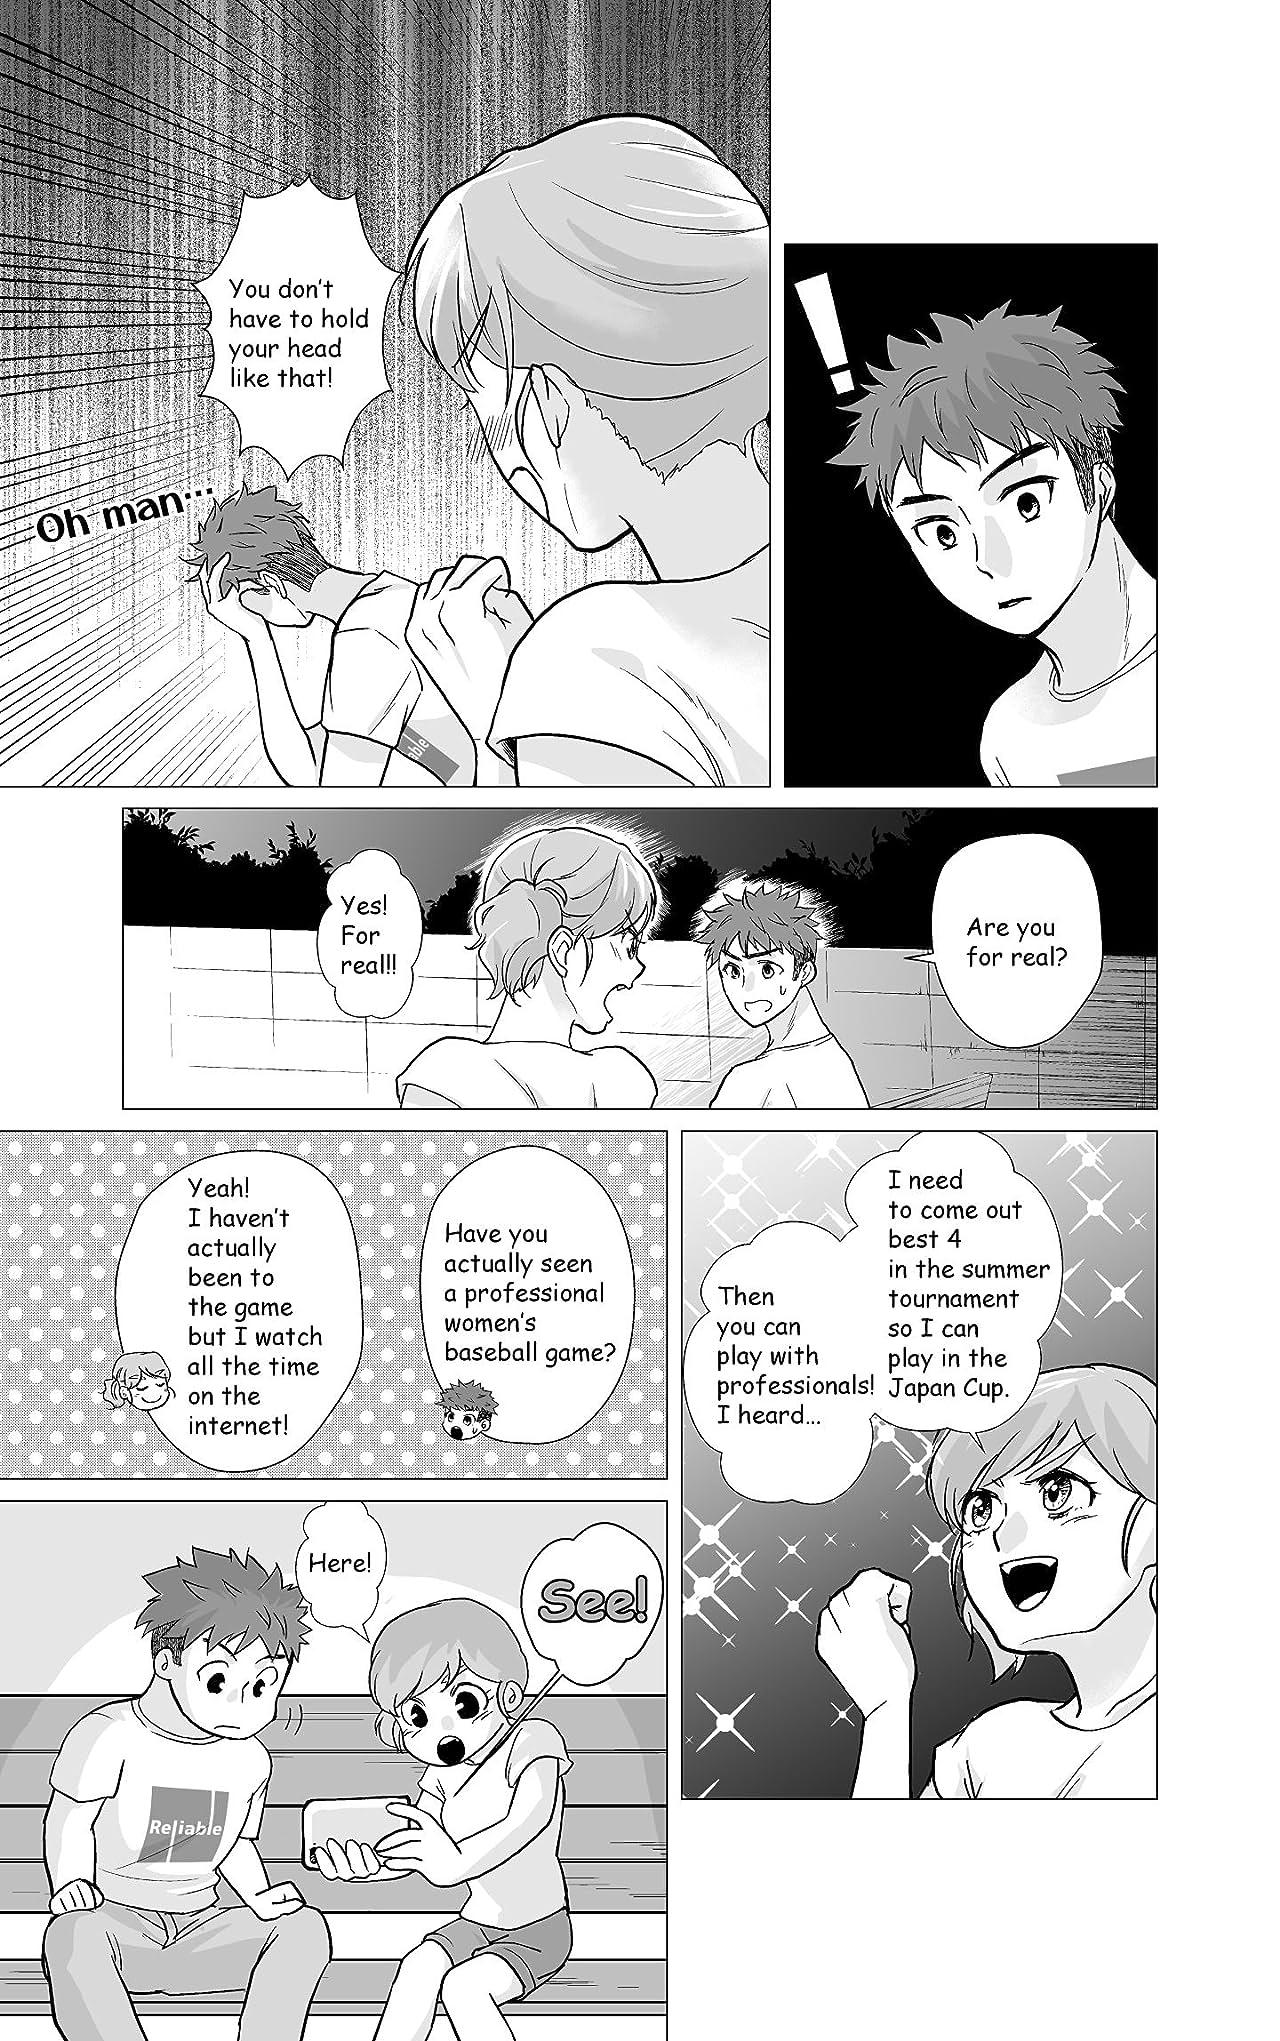 Karin's mound: New Edition Vol. 3